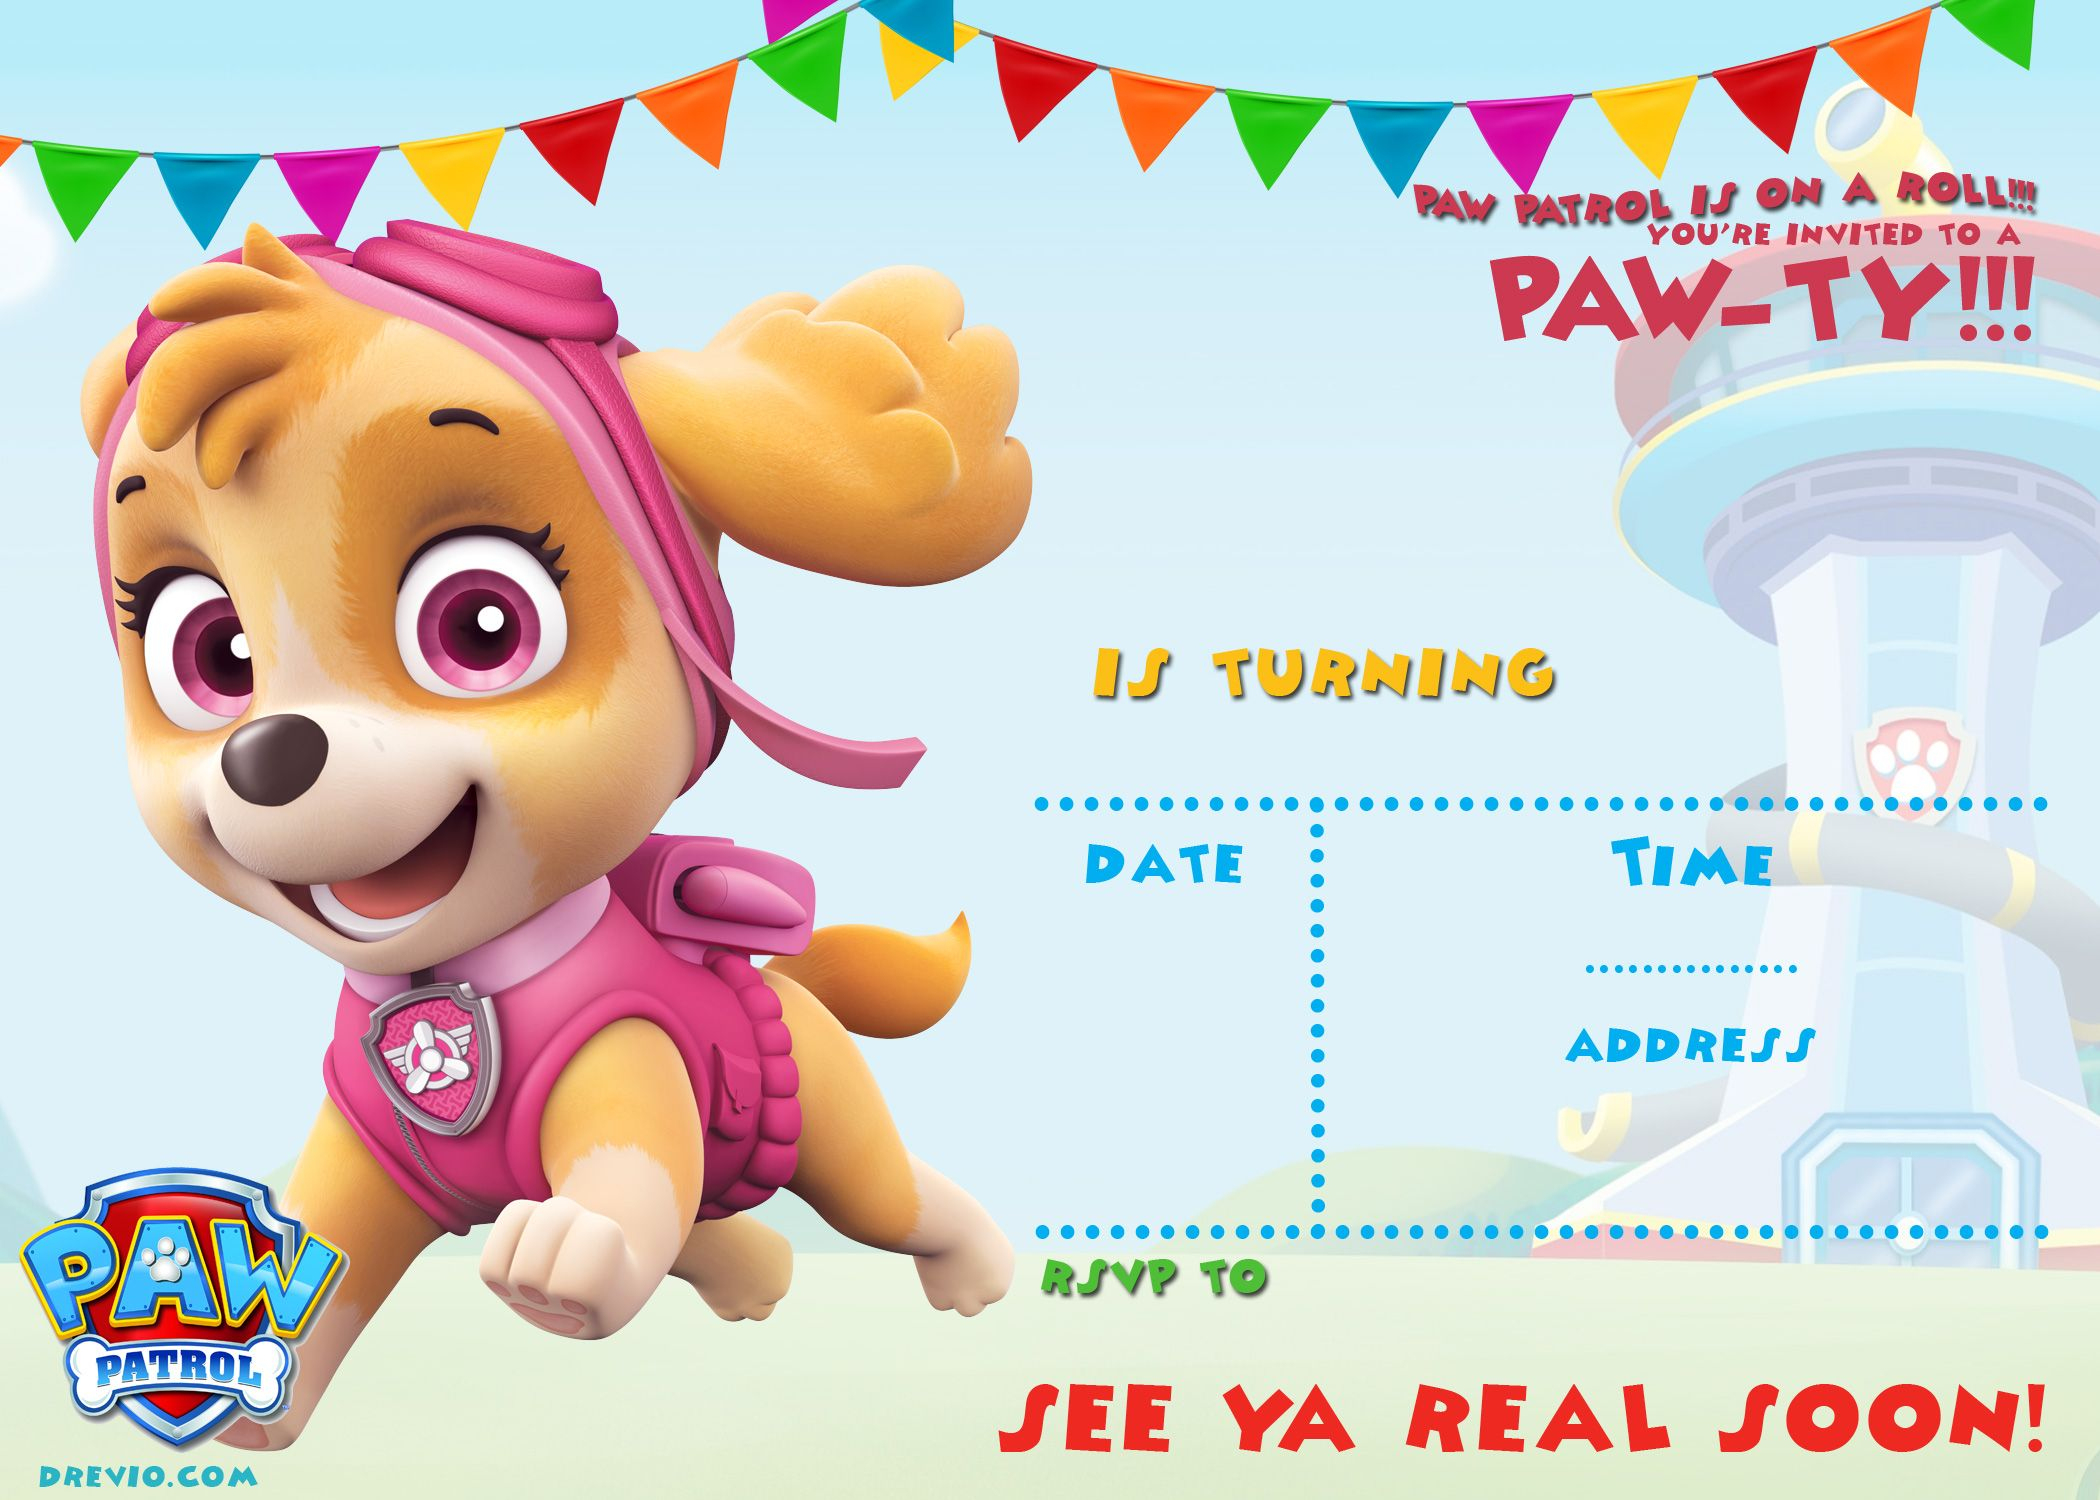 Free Printable Paw Patrol Invitation Template - All | Free - Free Printable Paw Patrol Invitations